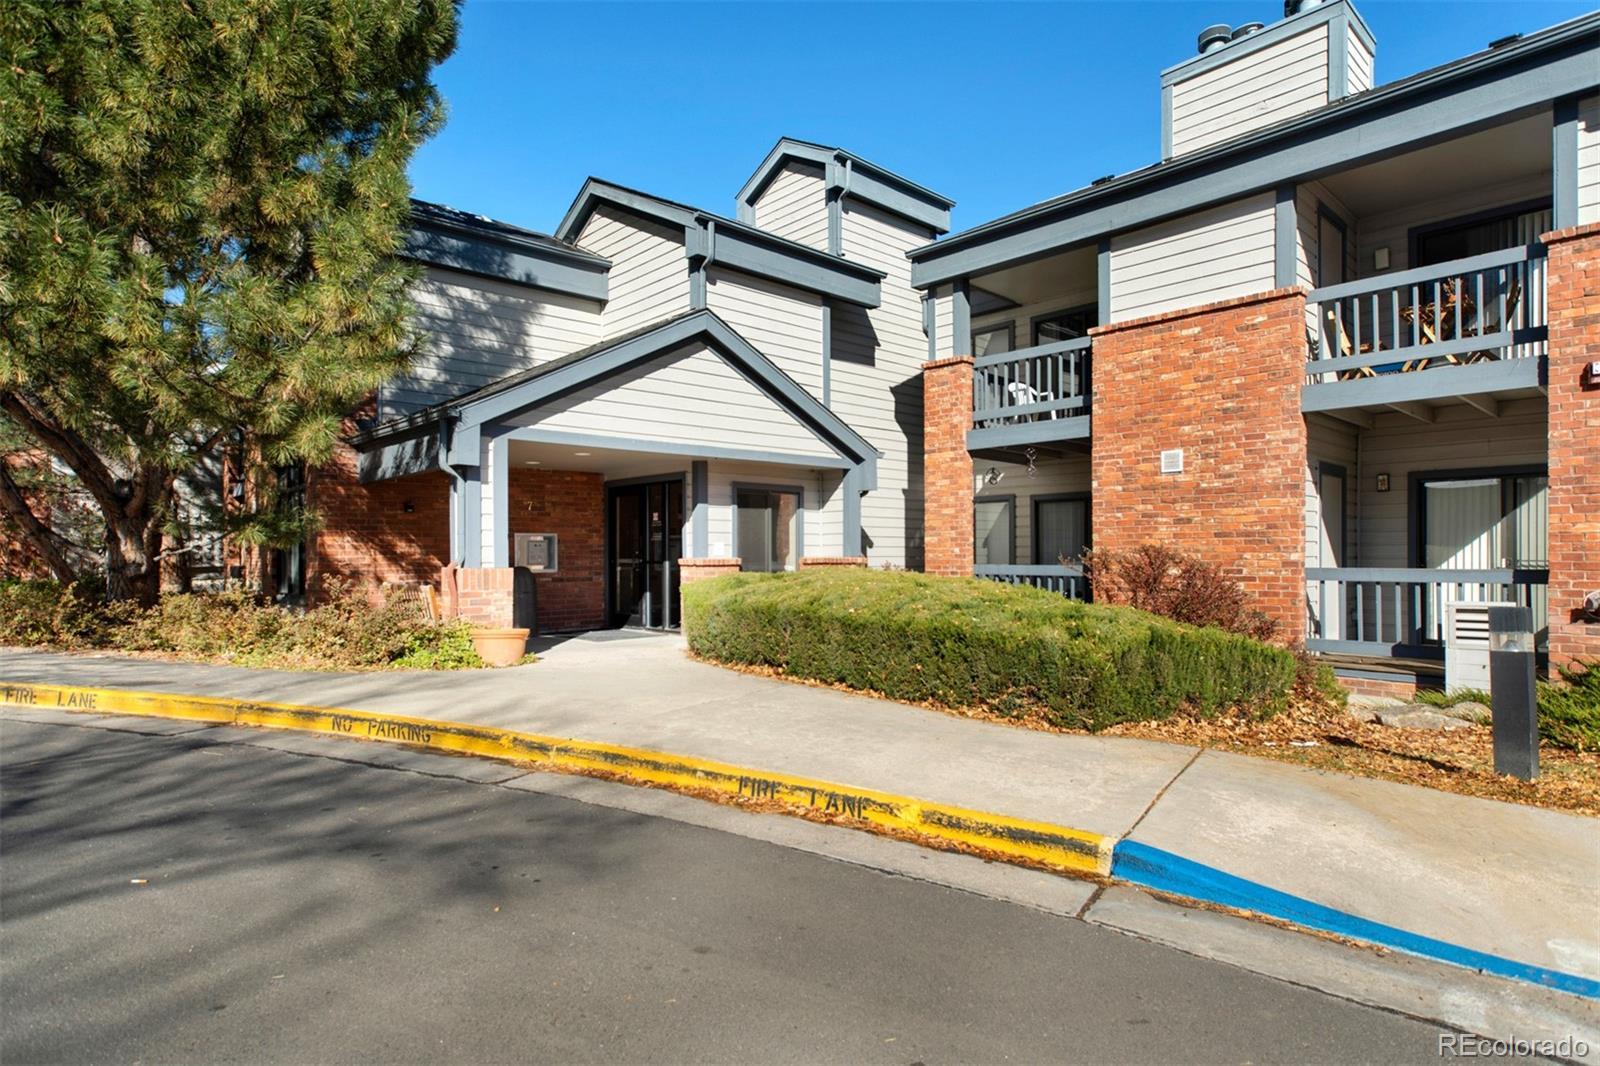 MLS# 3826145 - 2 - 2727 Folsom Street #123, Boulder, CO 80304